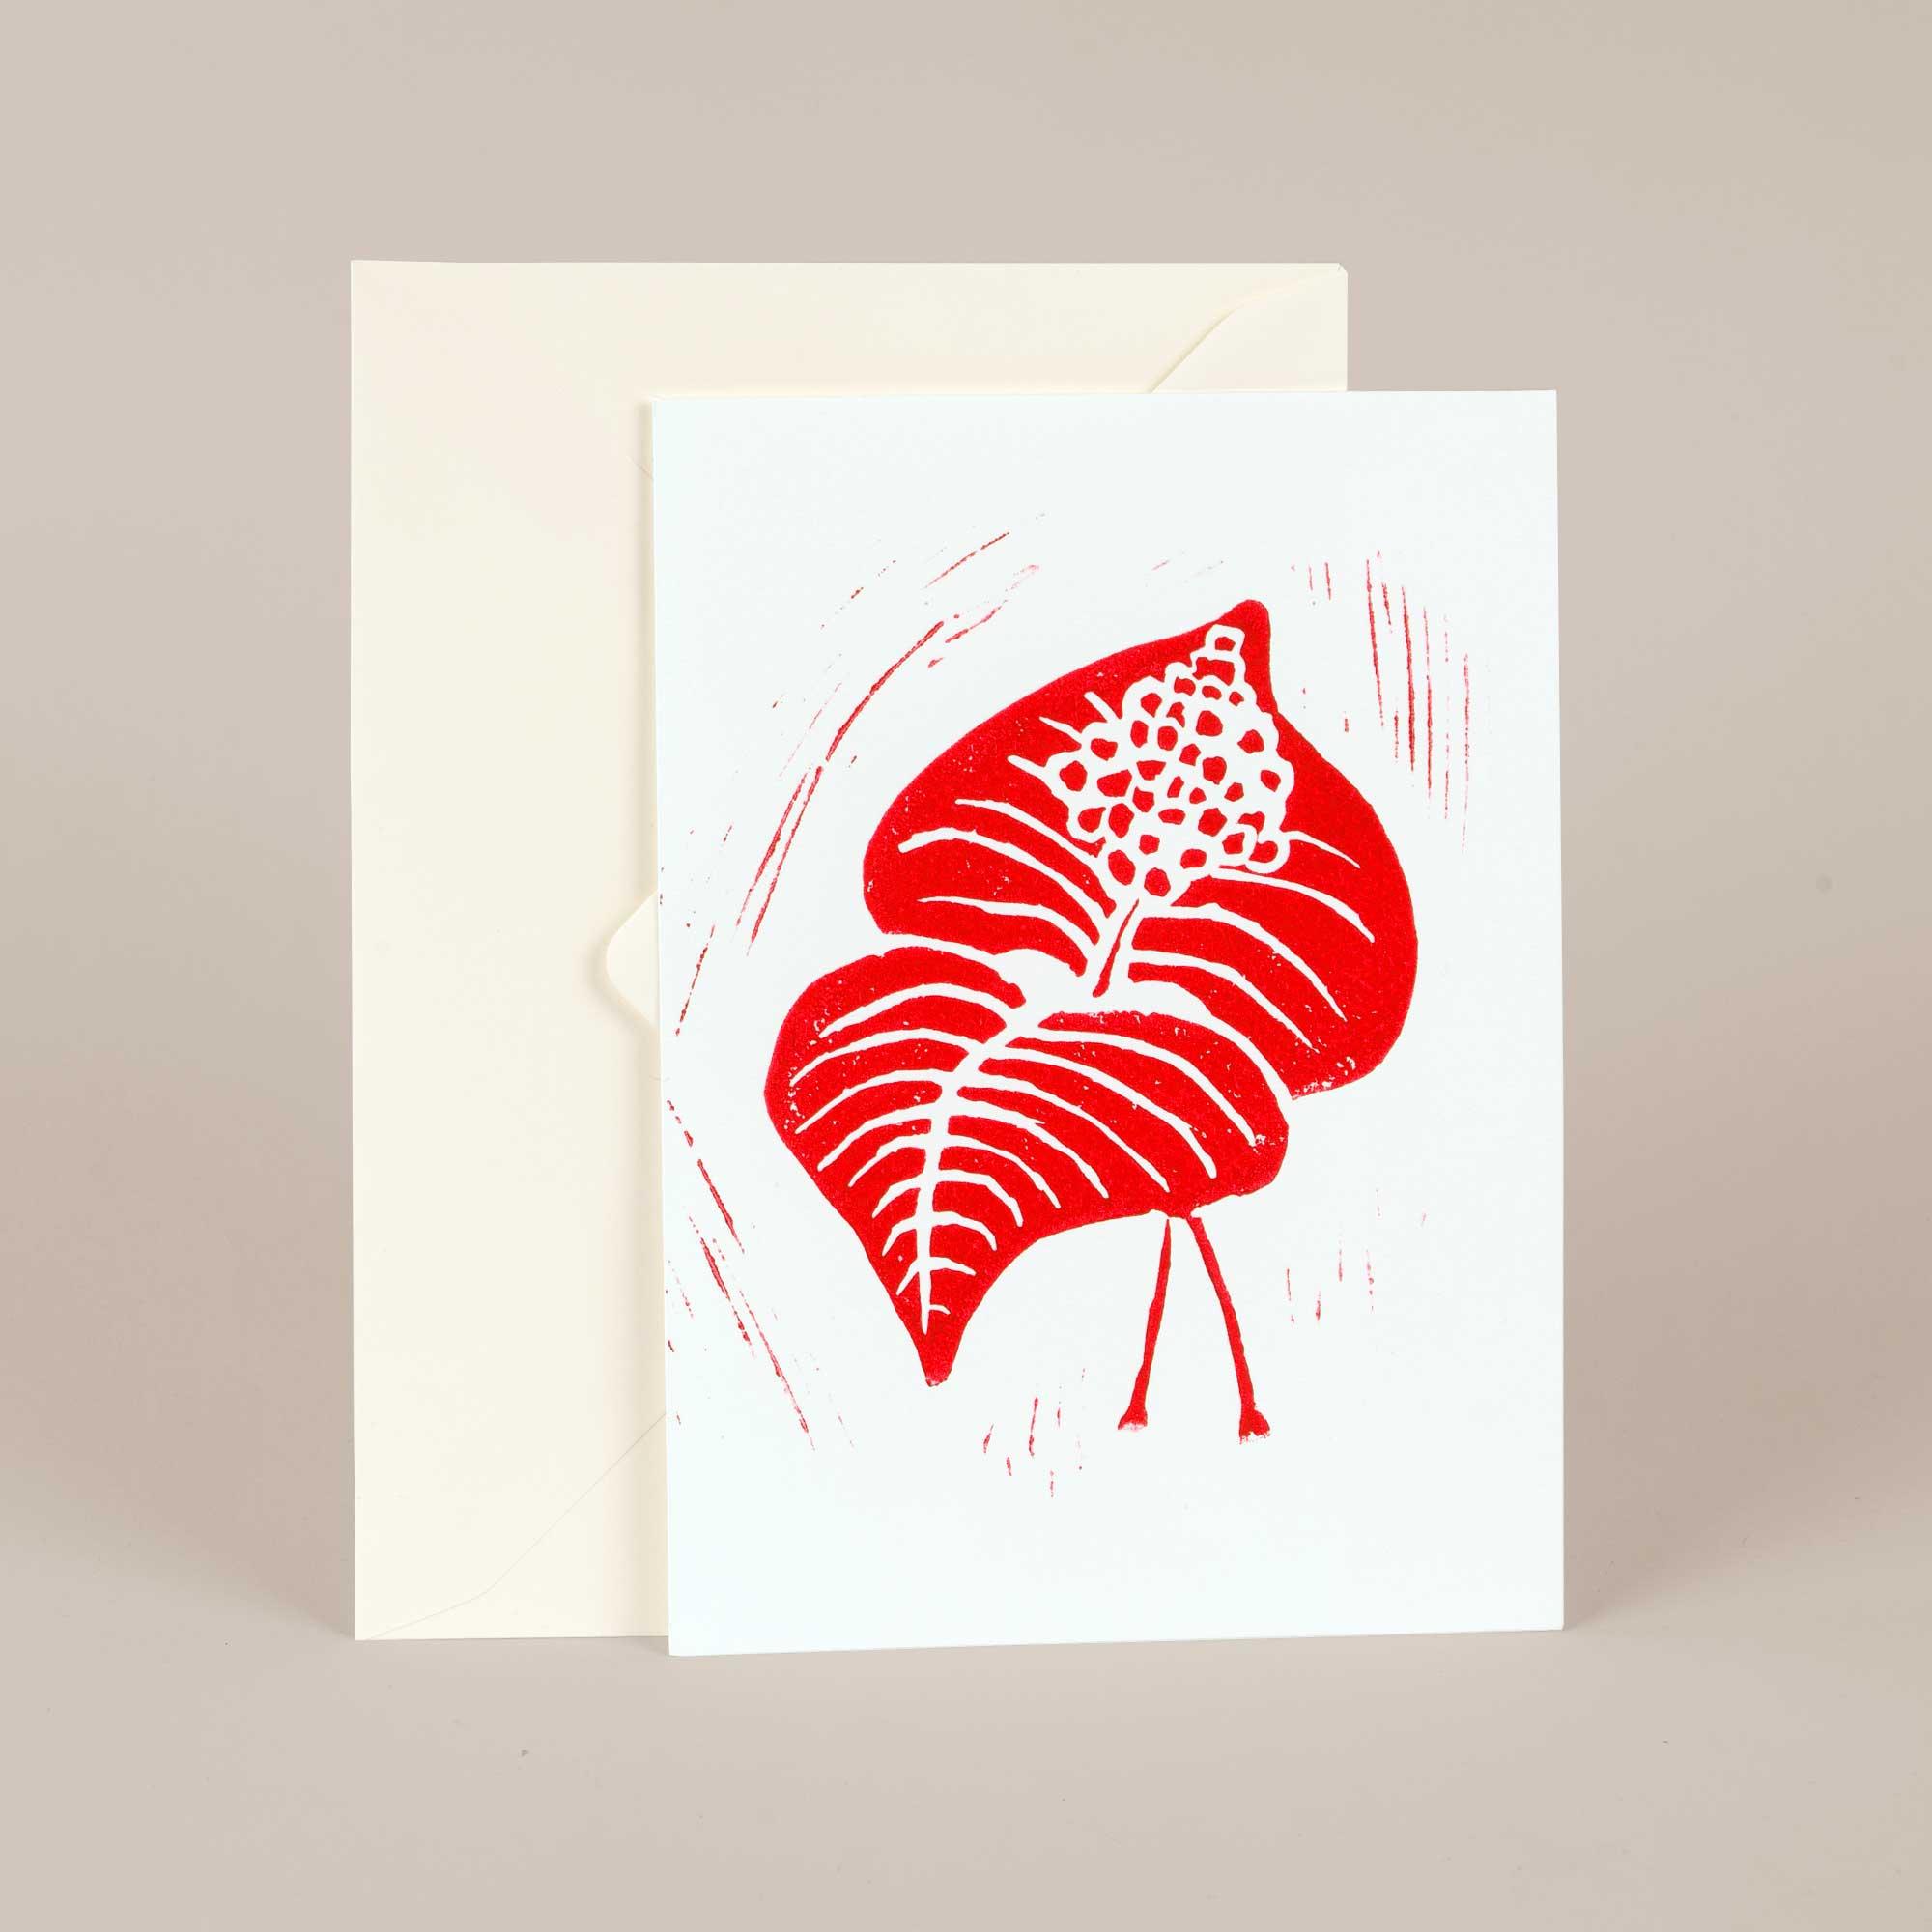 Linocut card, Berry, Linocut by Anne Rosenberg, RosenbergCph